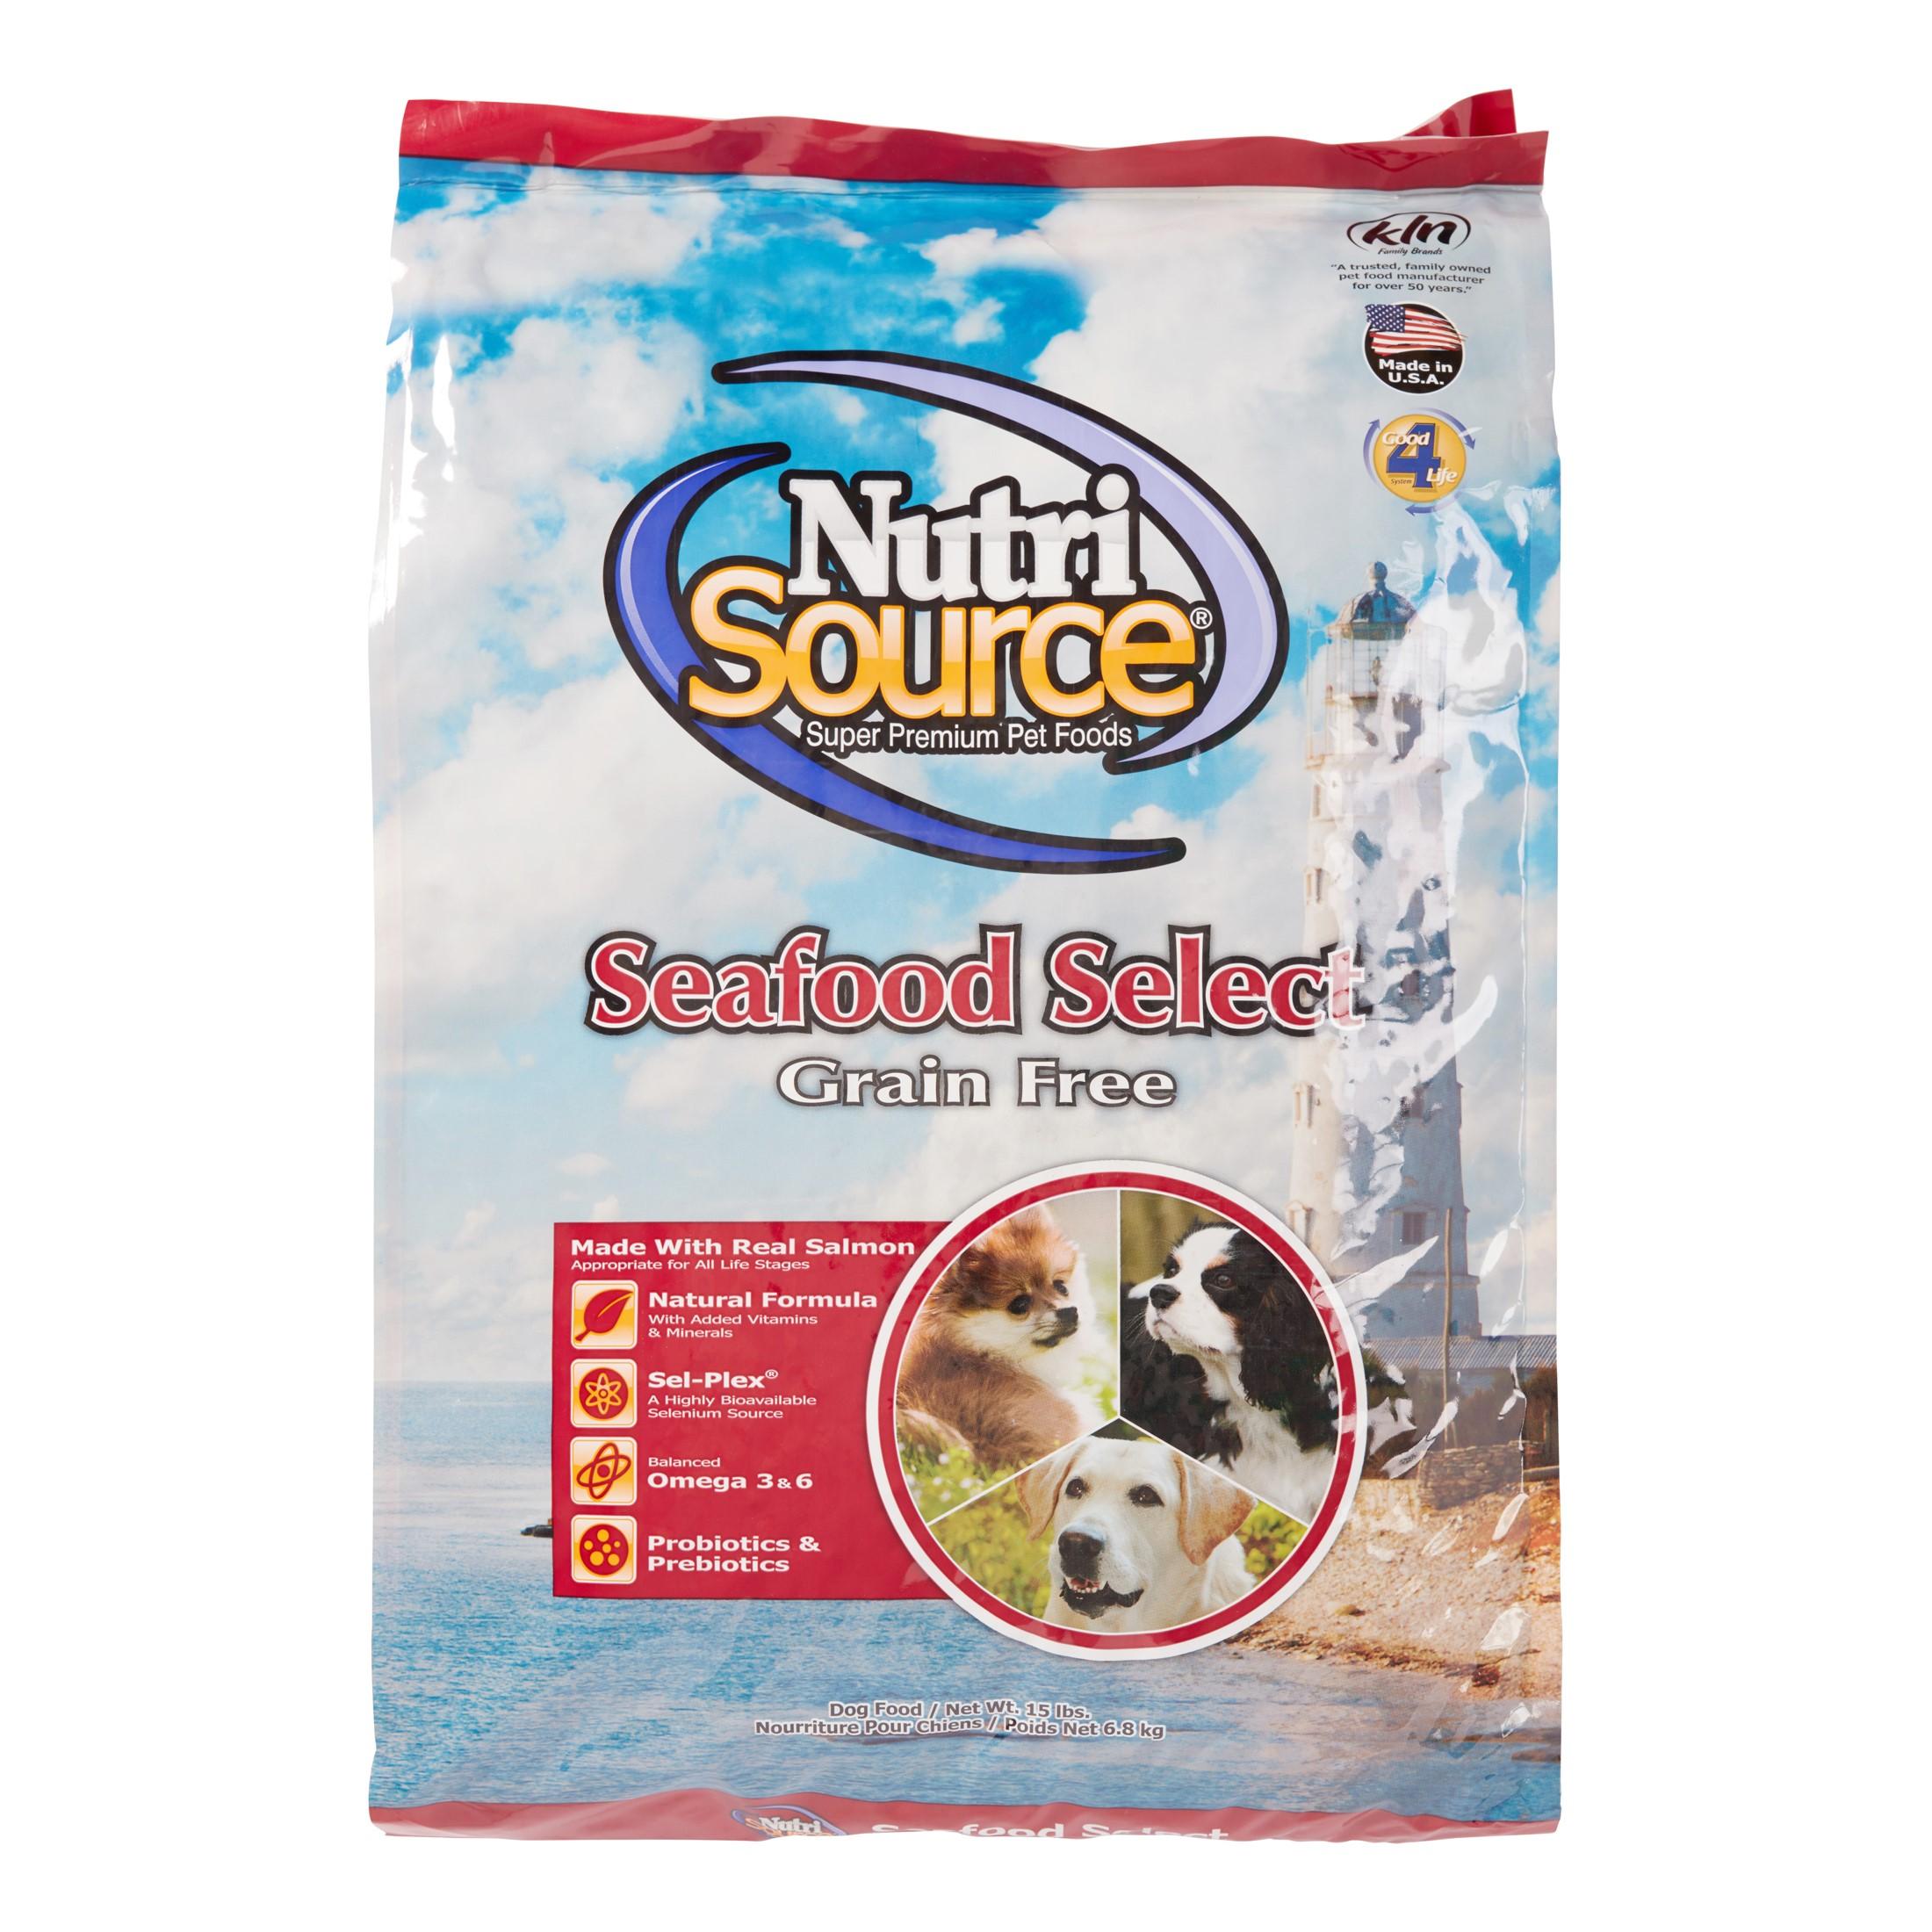 NutriSource Grain-Free Seafood Select Dry Dog Food, 15 lb